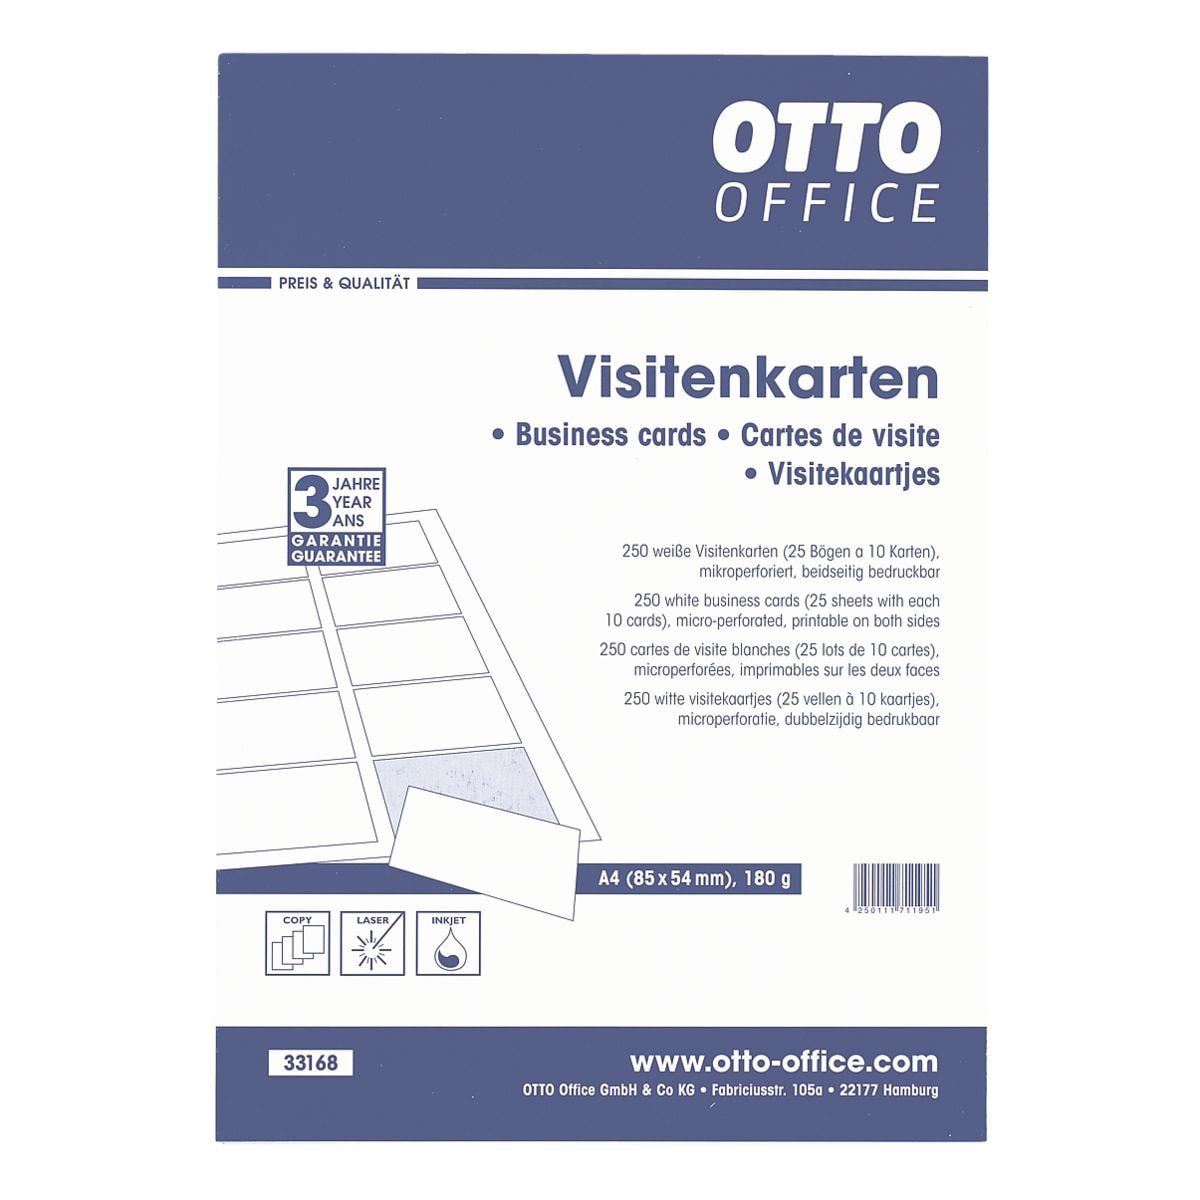 Otto Office Visitenkarten Bei Otto Office Günstig Kaufen